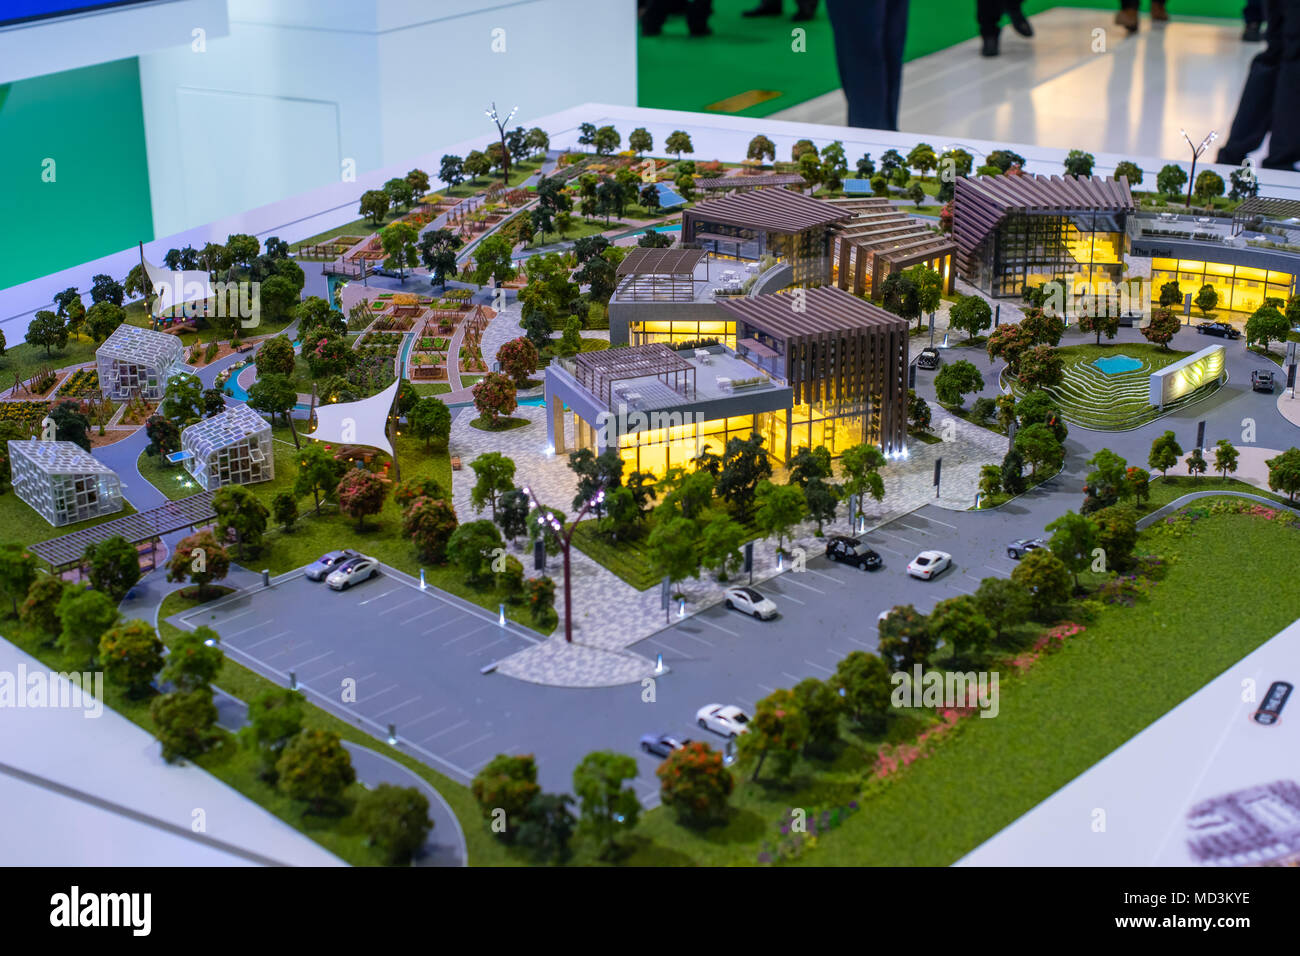 ADNEC, Abu Dhabi, UAE - 18th April, 2018: 3D Models of